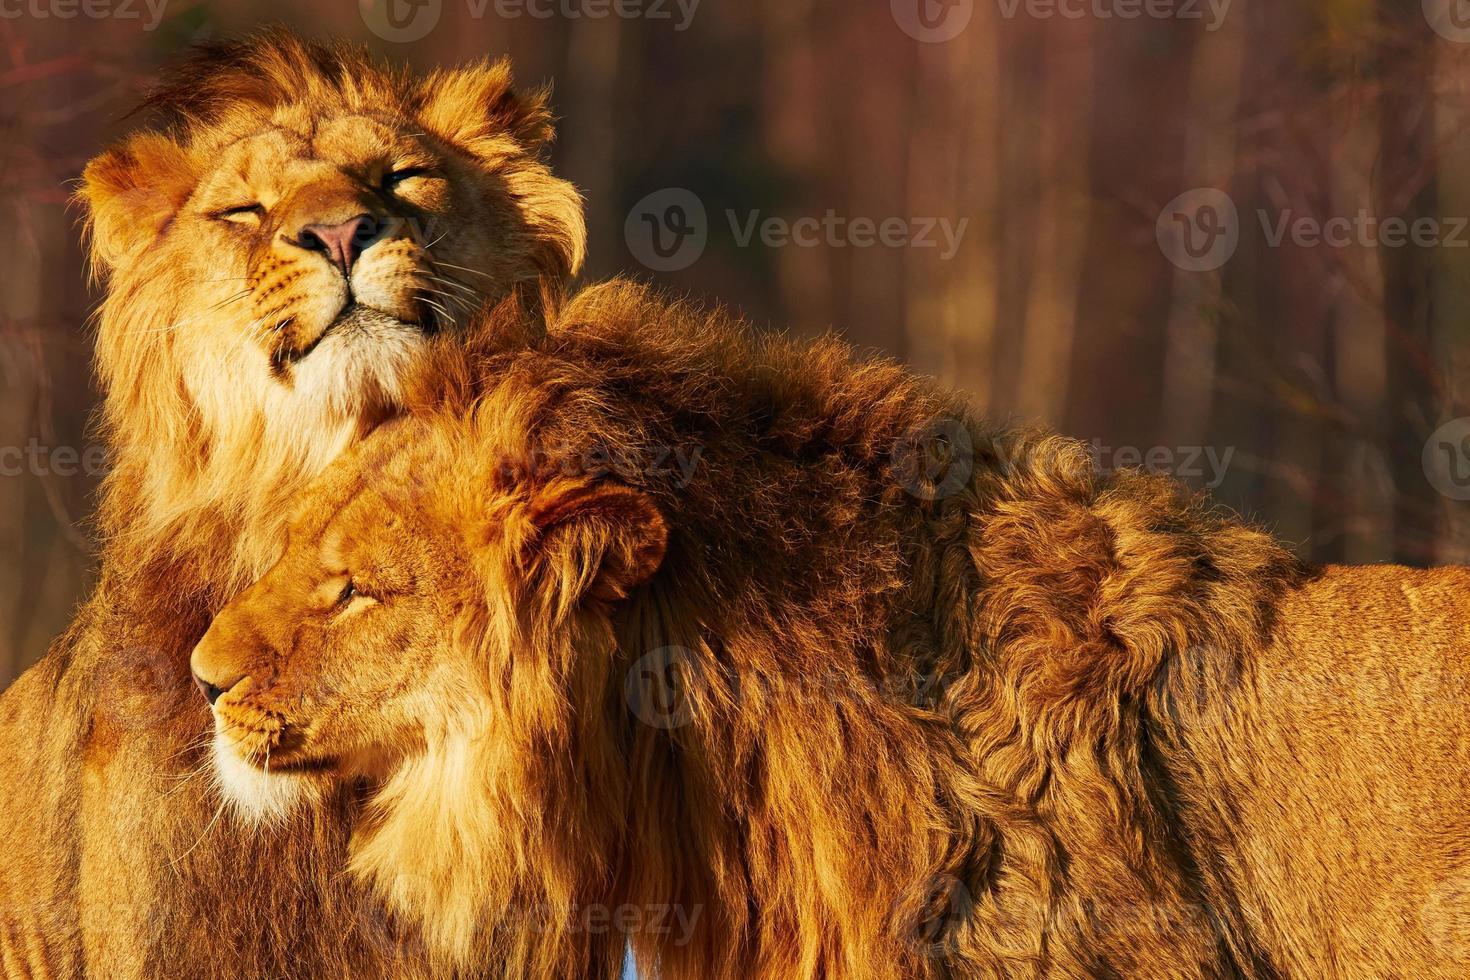 två lejon nära varandra foto